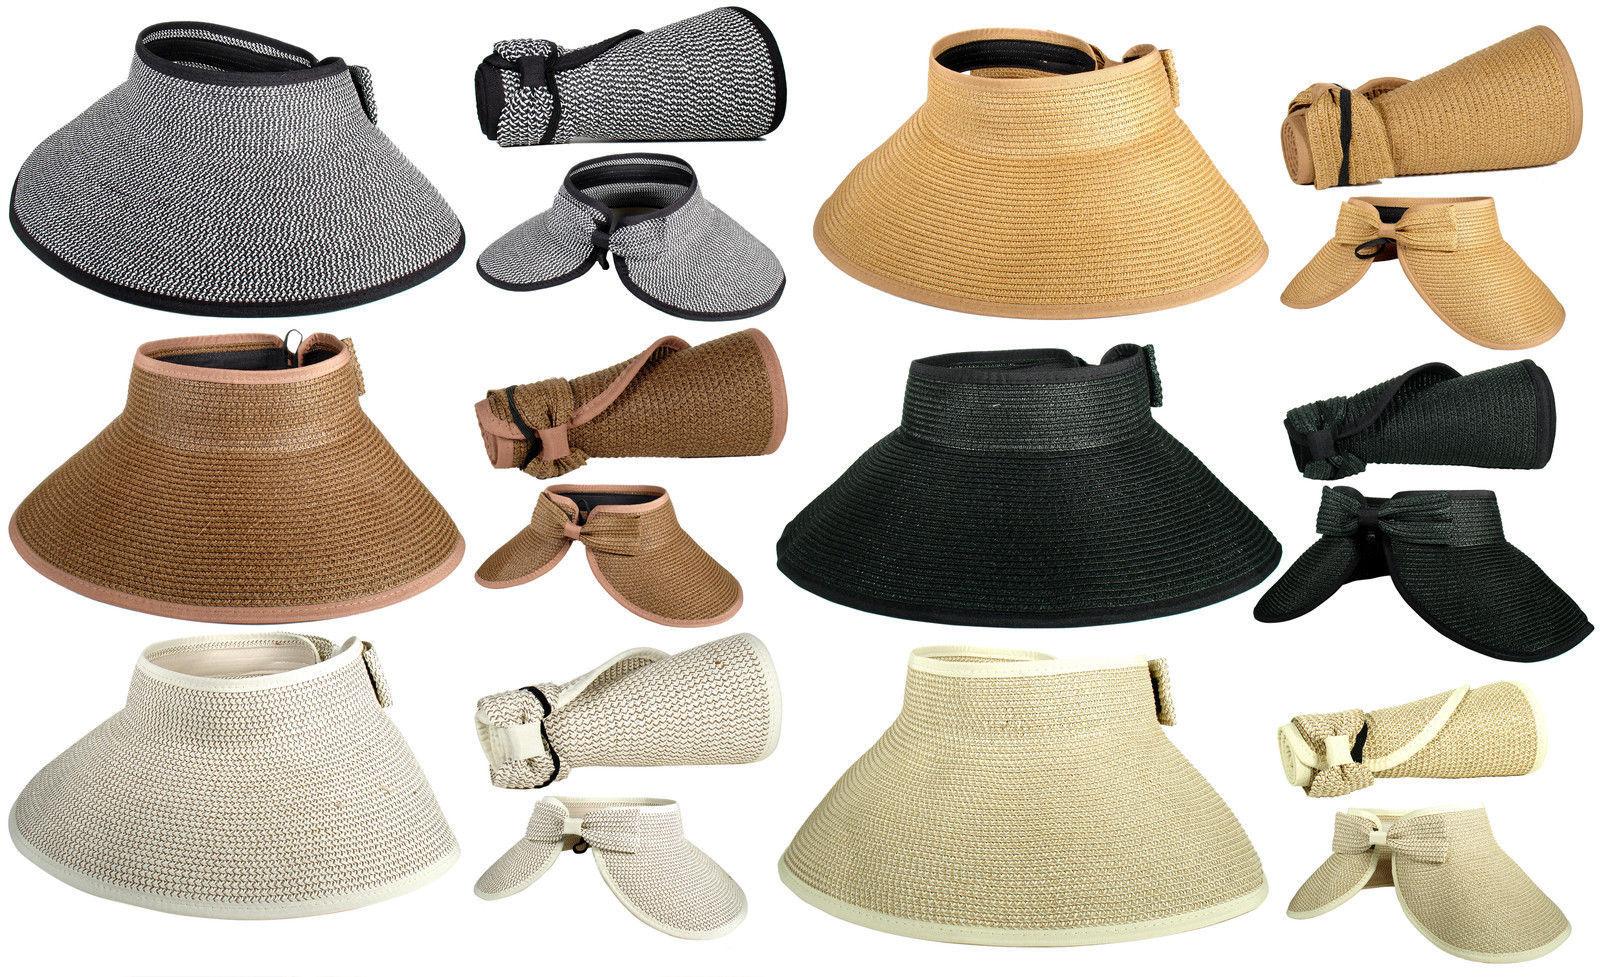 facd5126b40cd Fashion Foldable Adjustable Roll Up Wide Brim Straw Bow Sun Visor Floppy  Cap Hat -  8.49